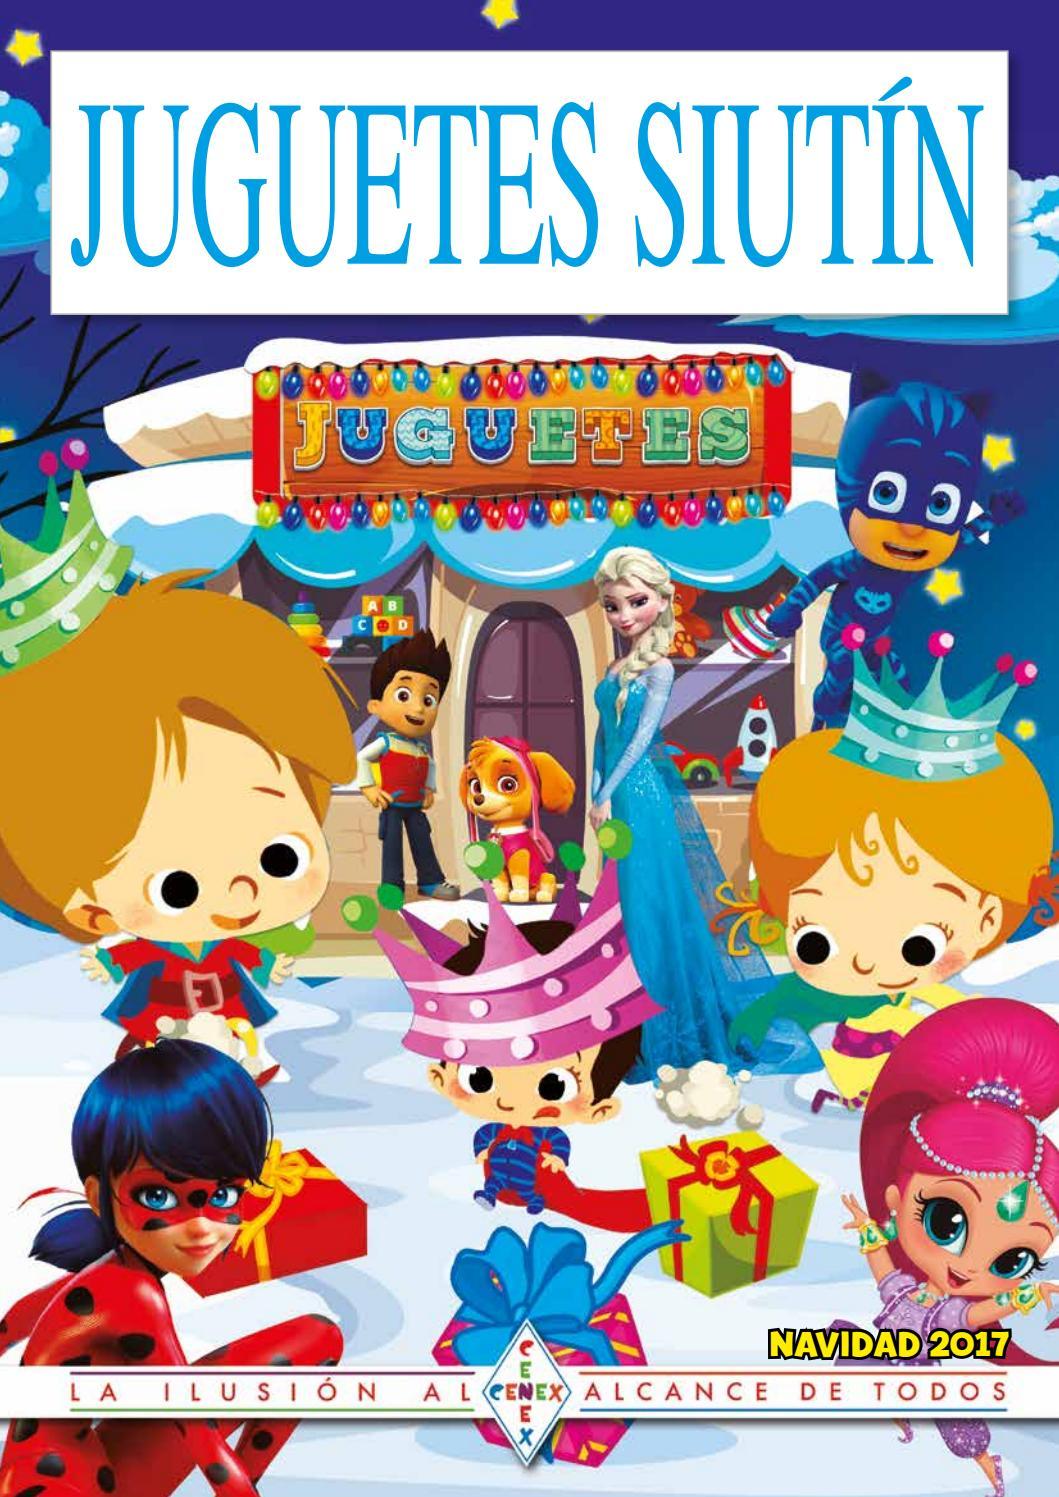 Juguetes Suitin Navidad 2017 By Solerdesign Issuu